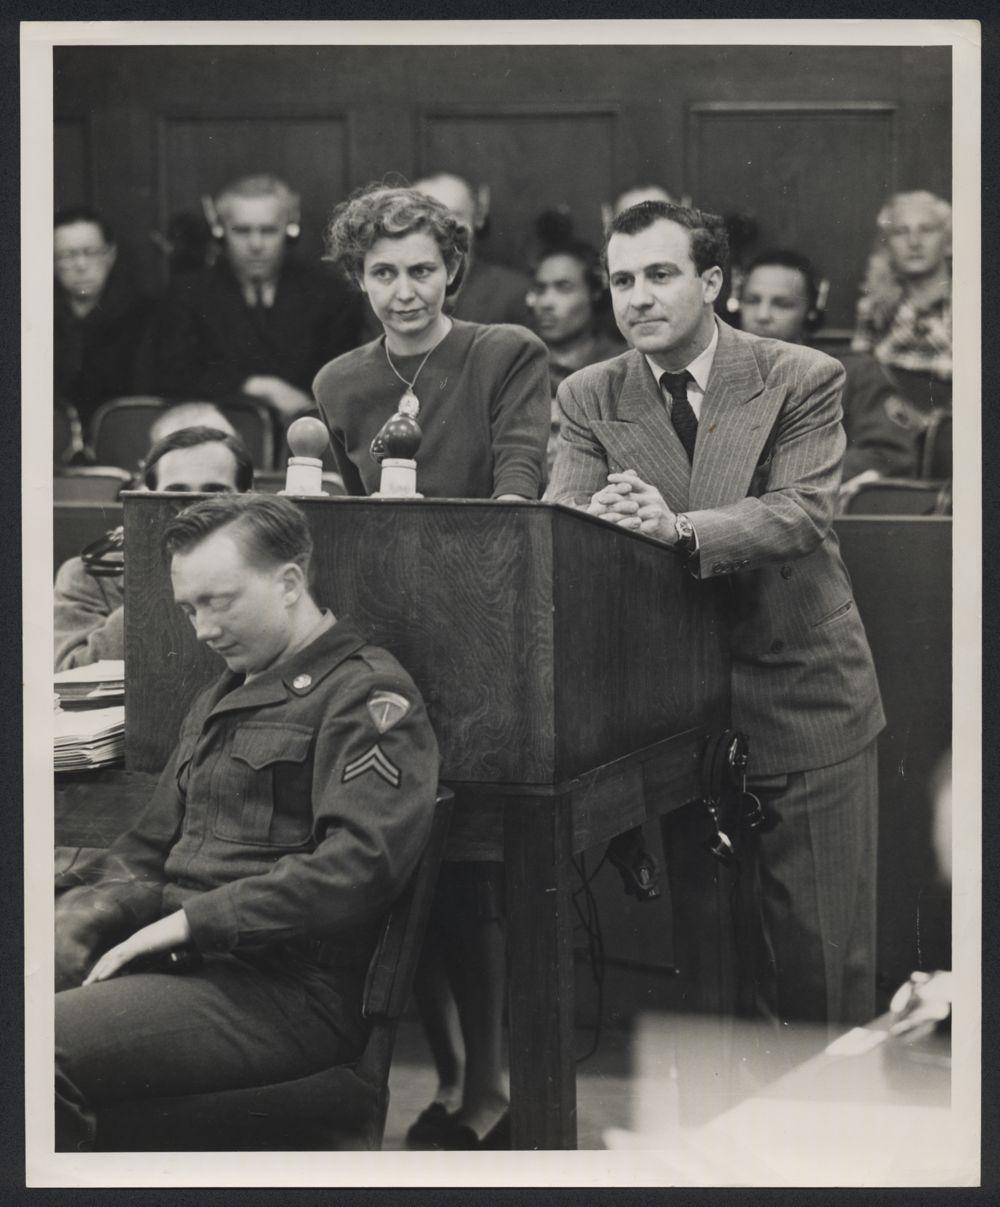 Dorothea G. Minskoff and Emanuel E. Minskoff